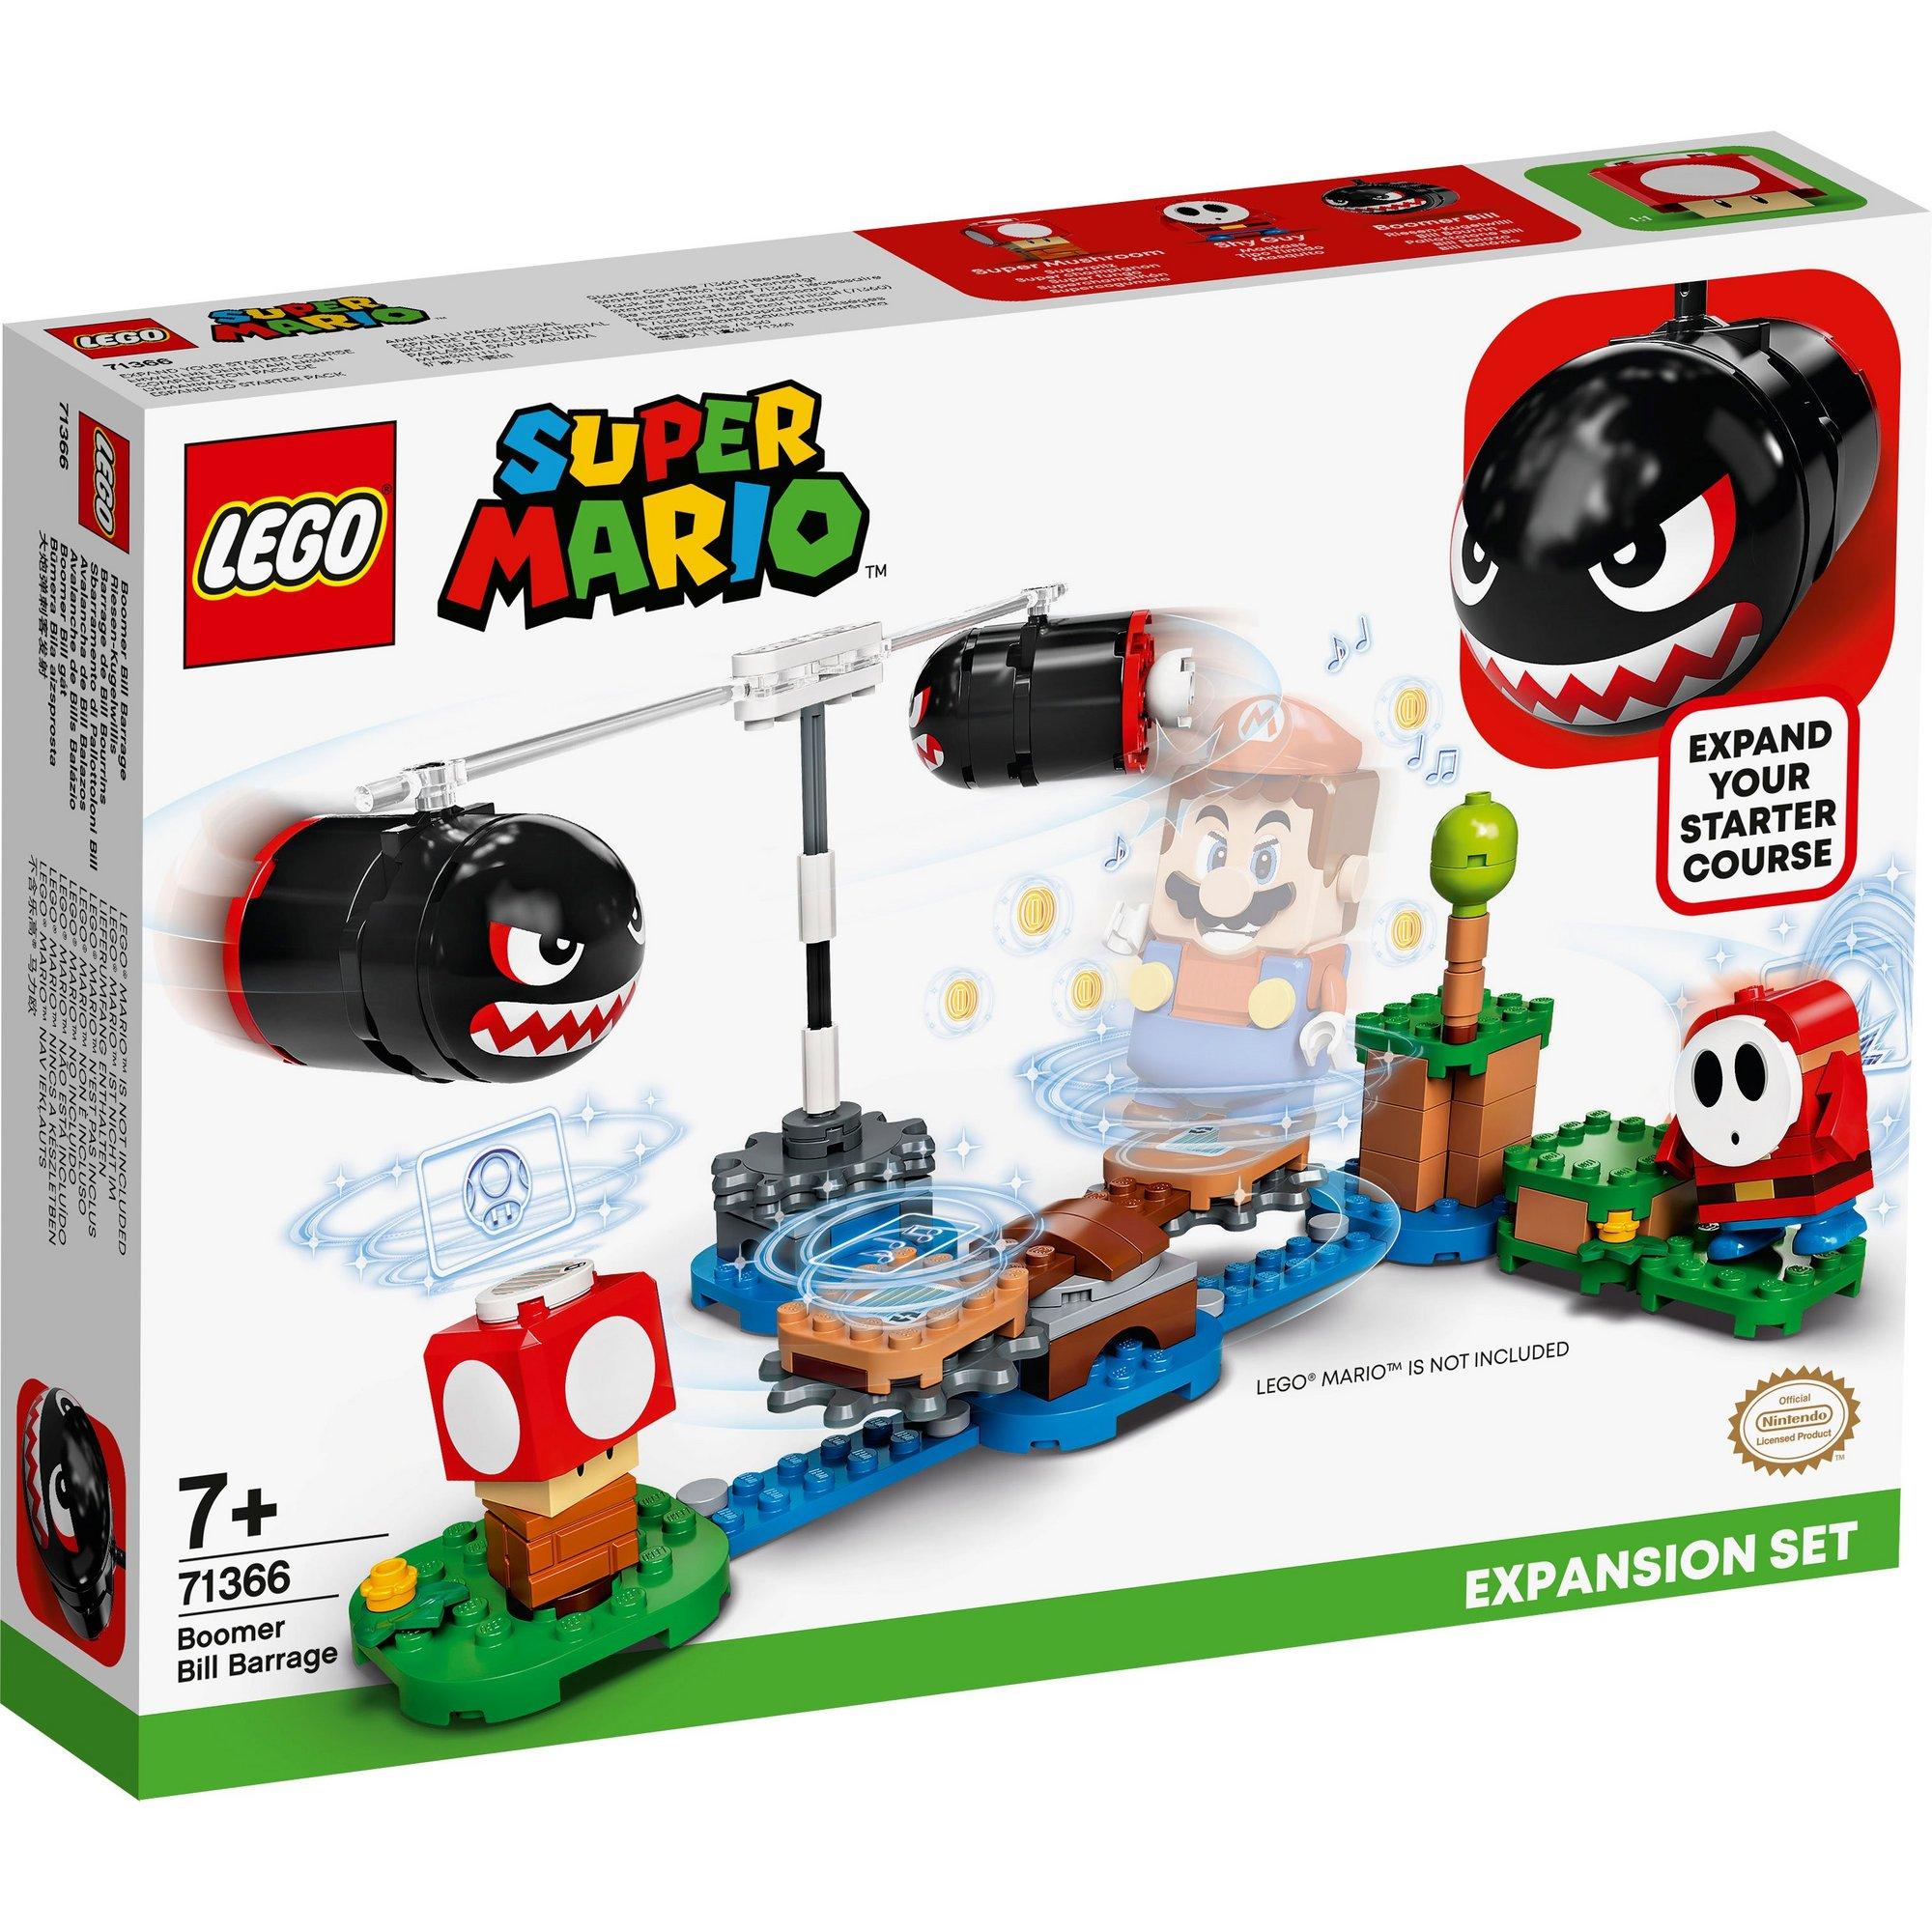 Image of LEGO Super Mario Boomer Bill Barrage Expansion Set